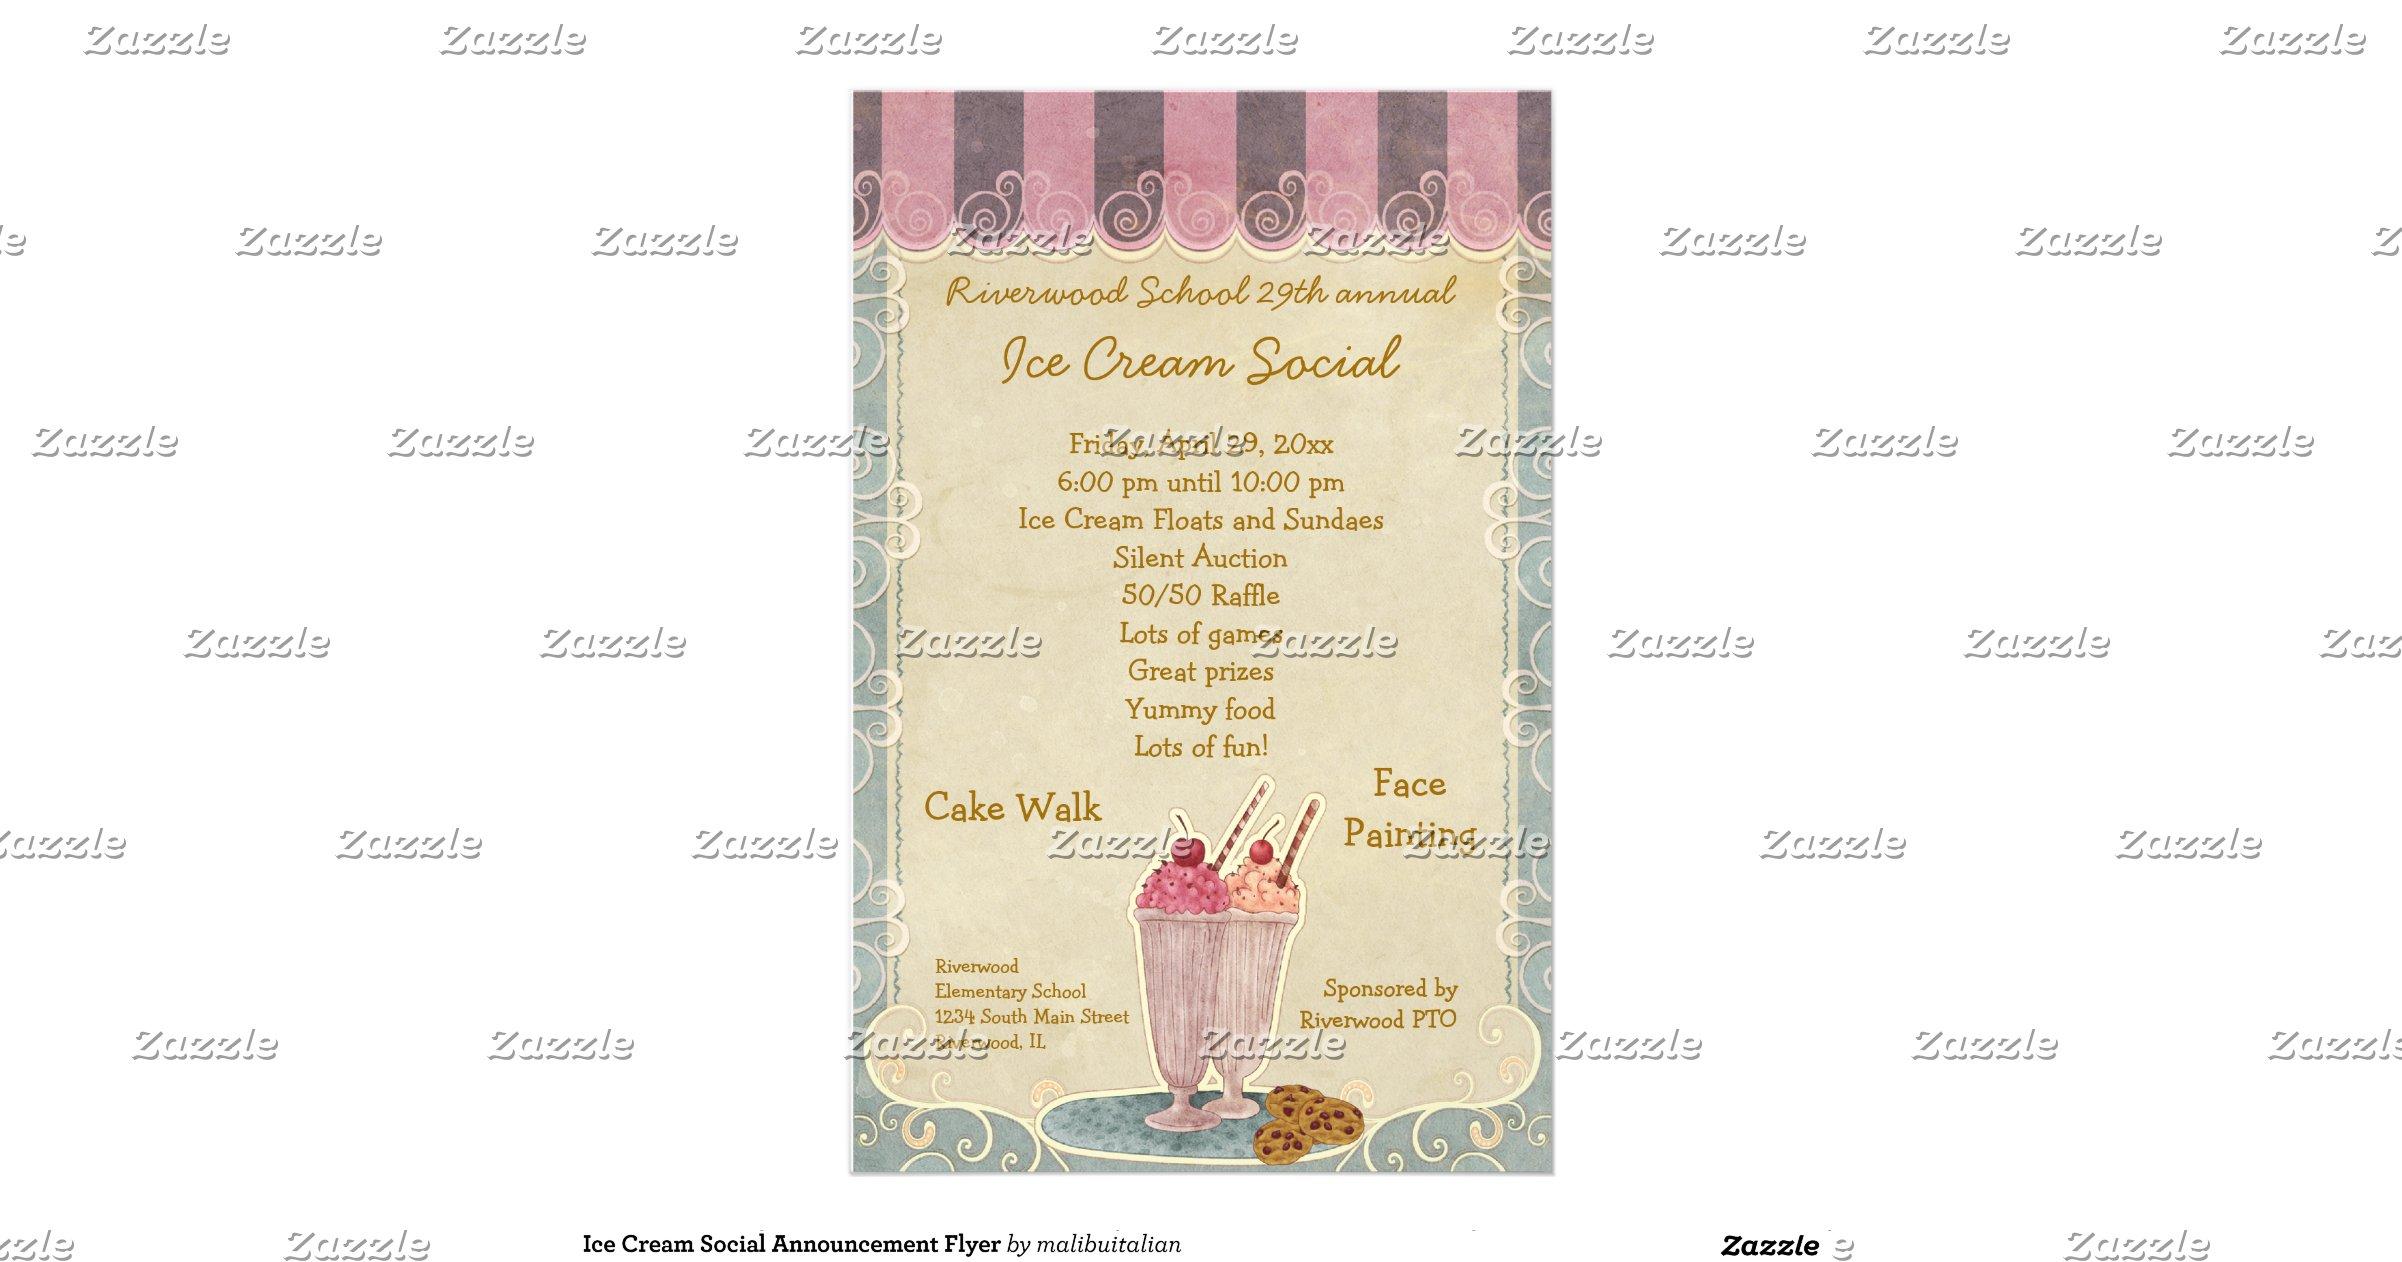 ice cream social announcement flyer